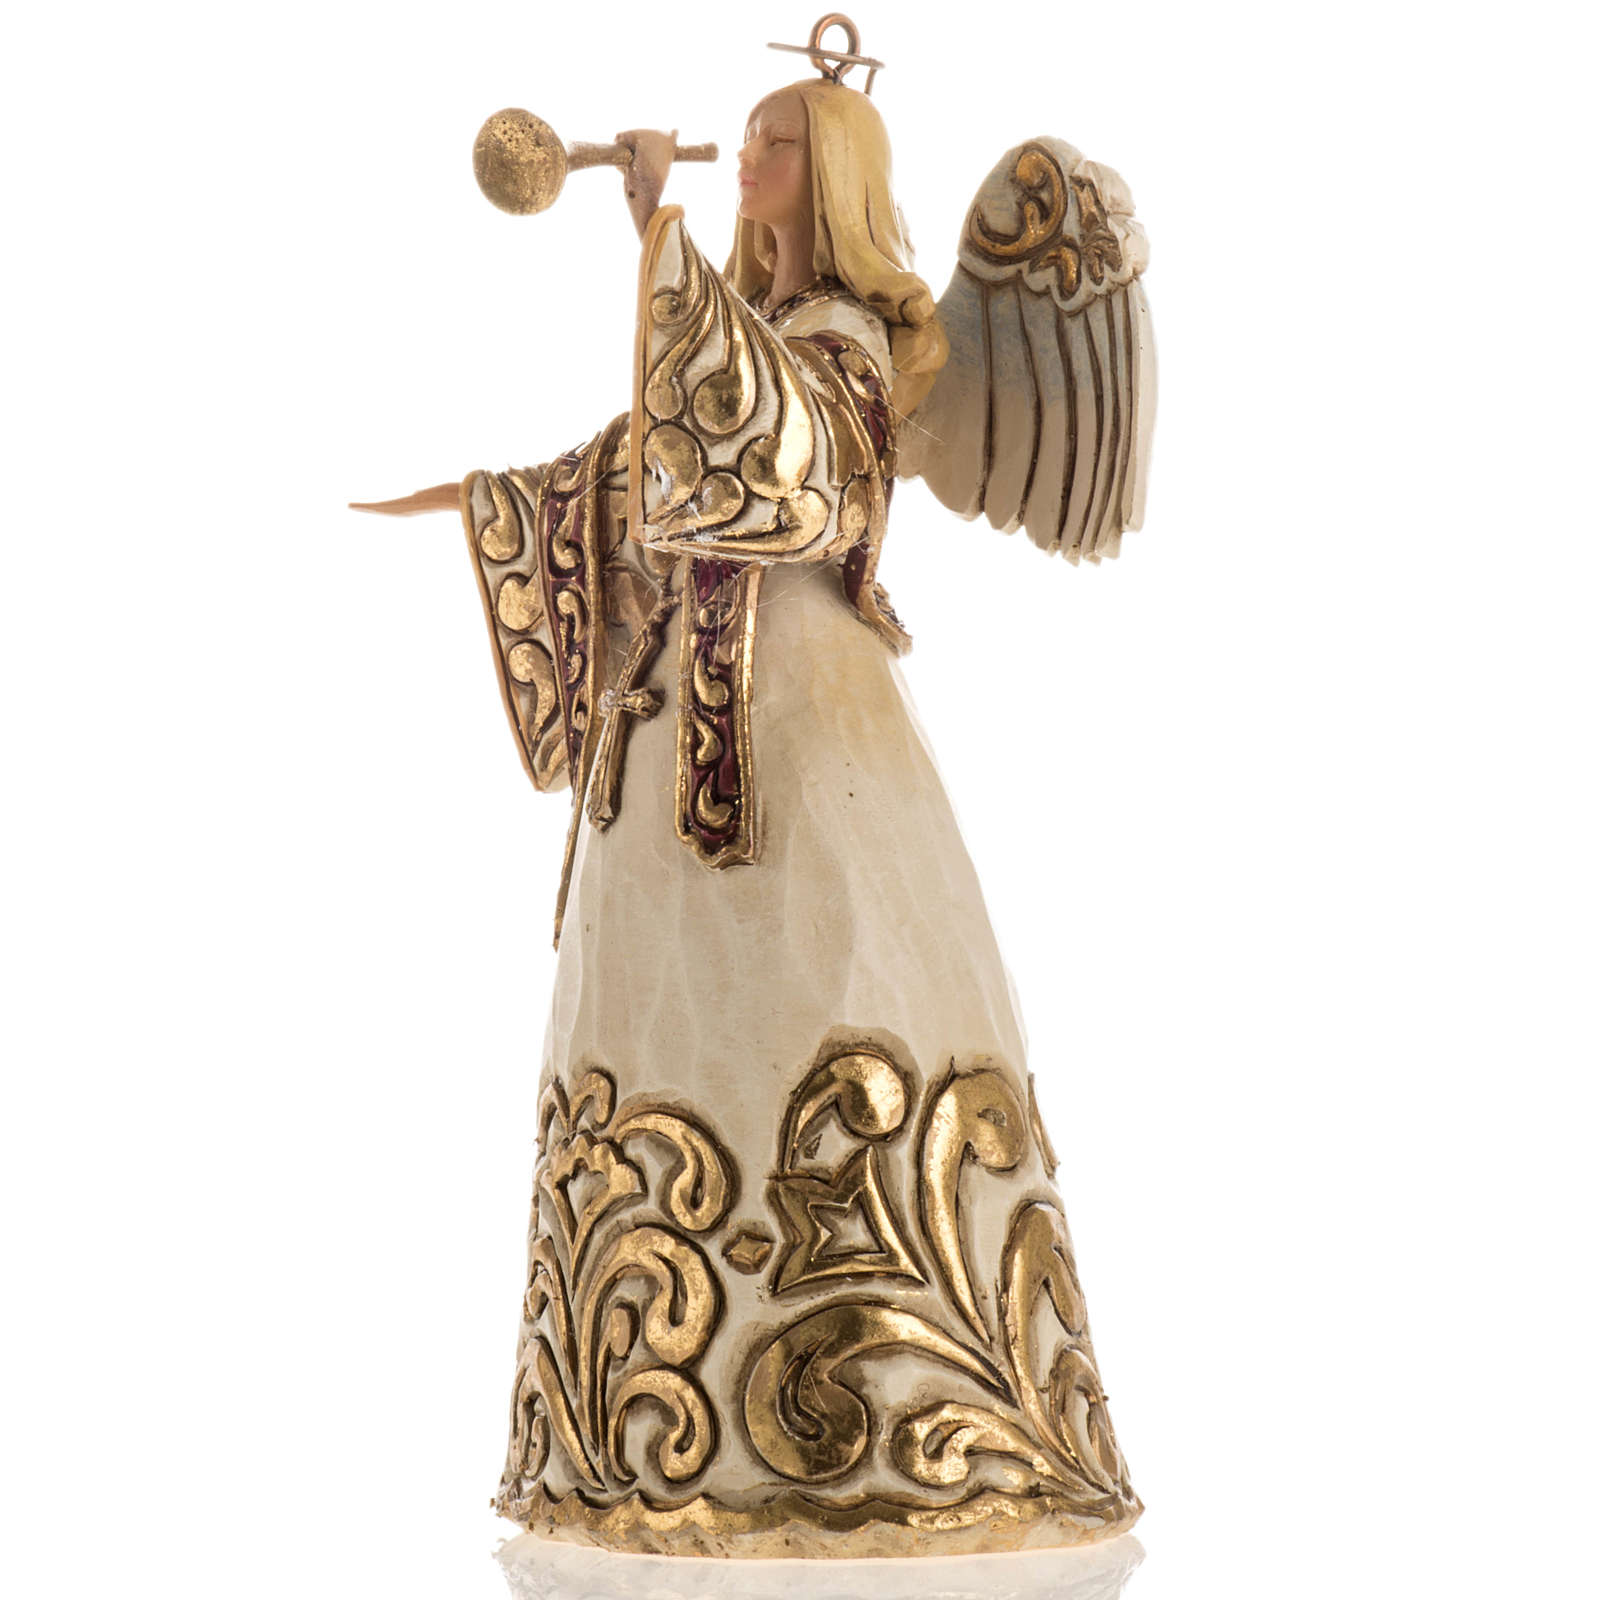 Ángel con la trompeta de Jim Shore (Ivory and Gold Angel) 4